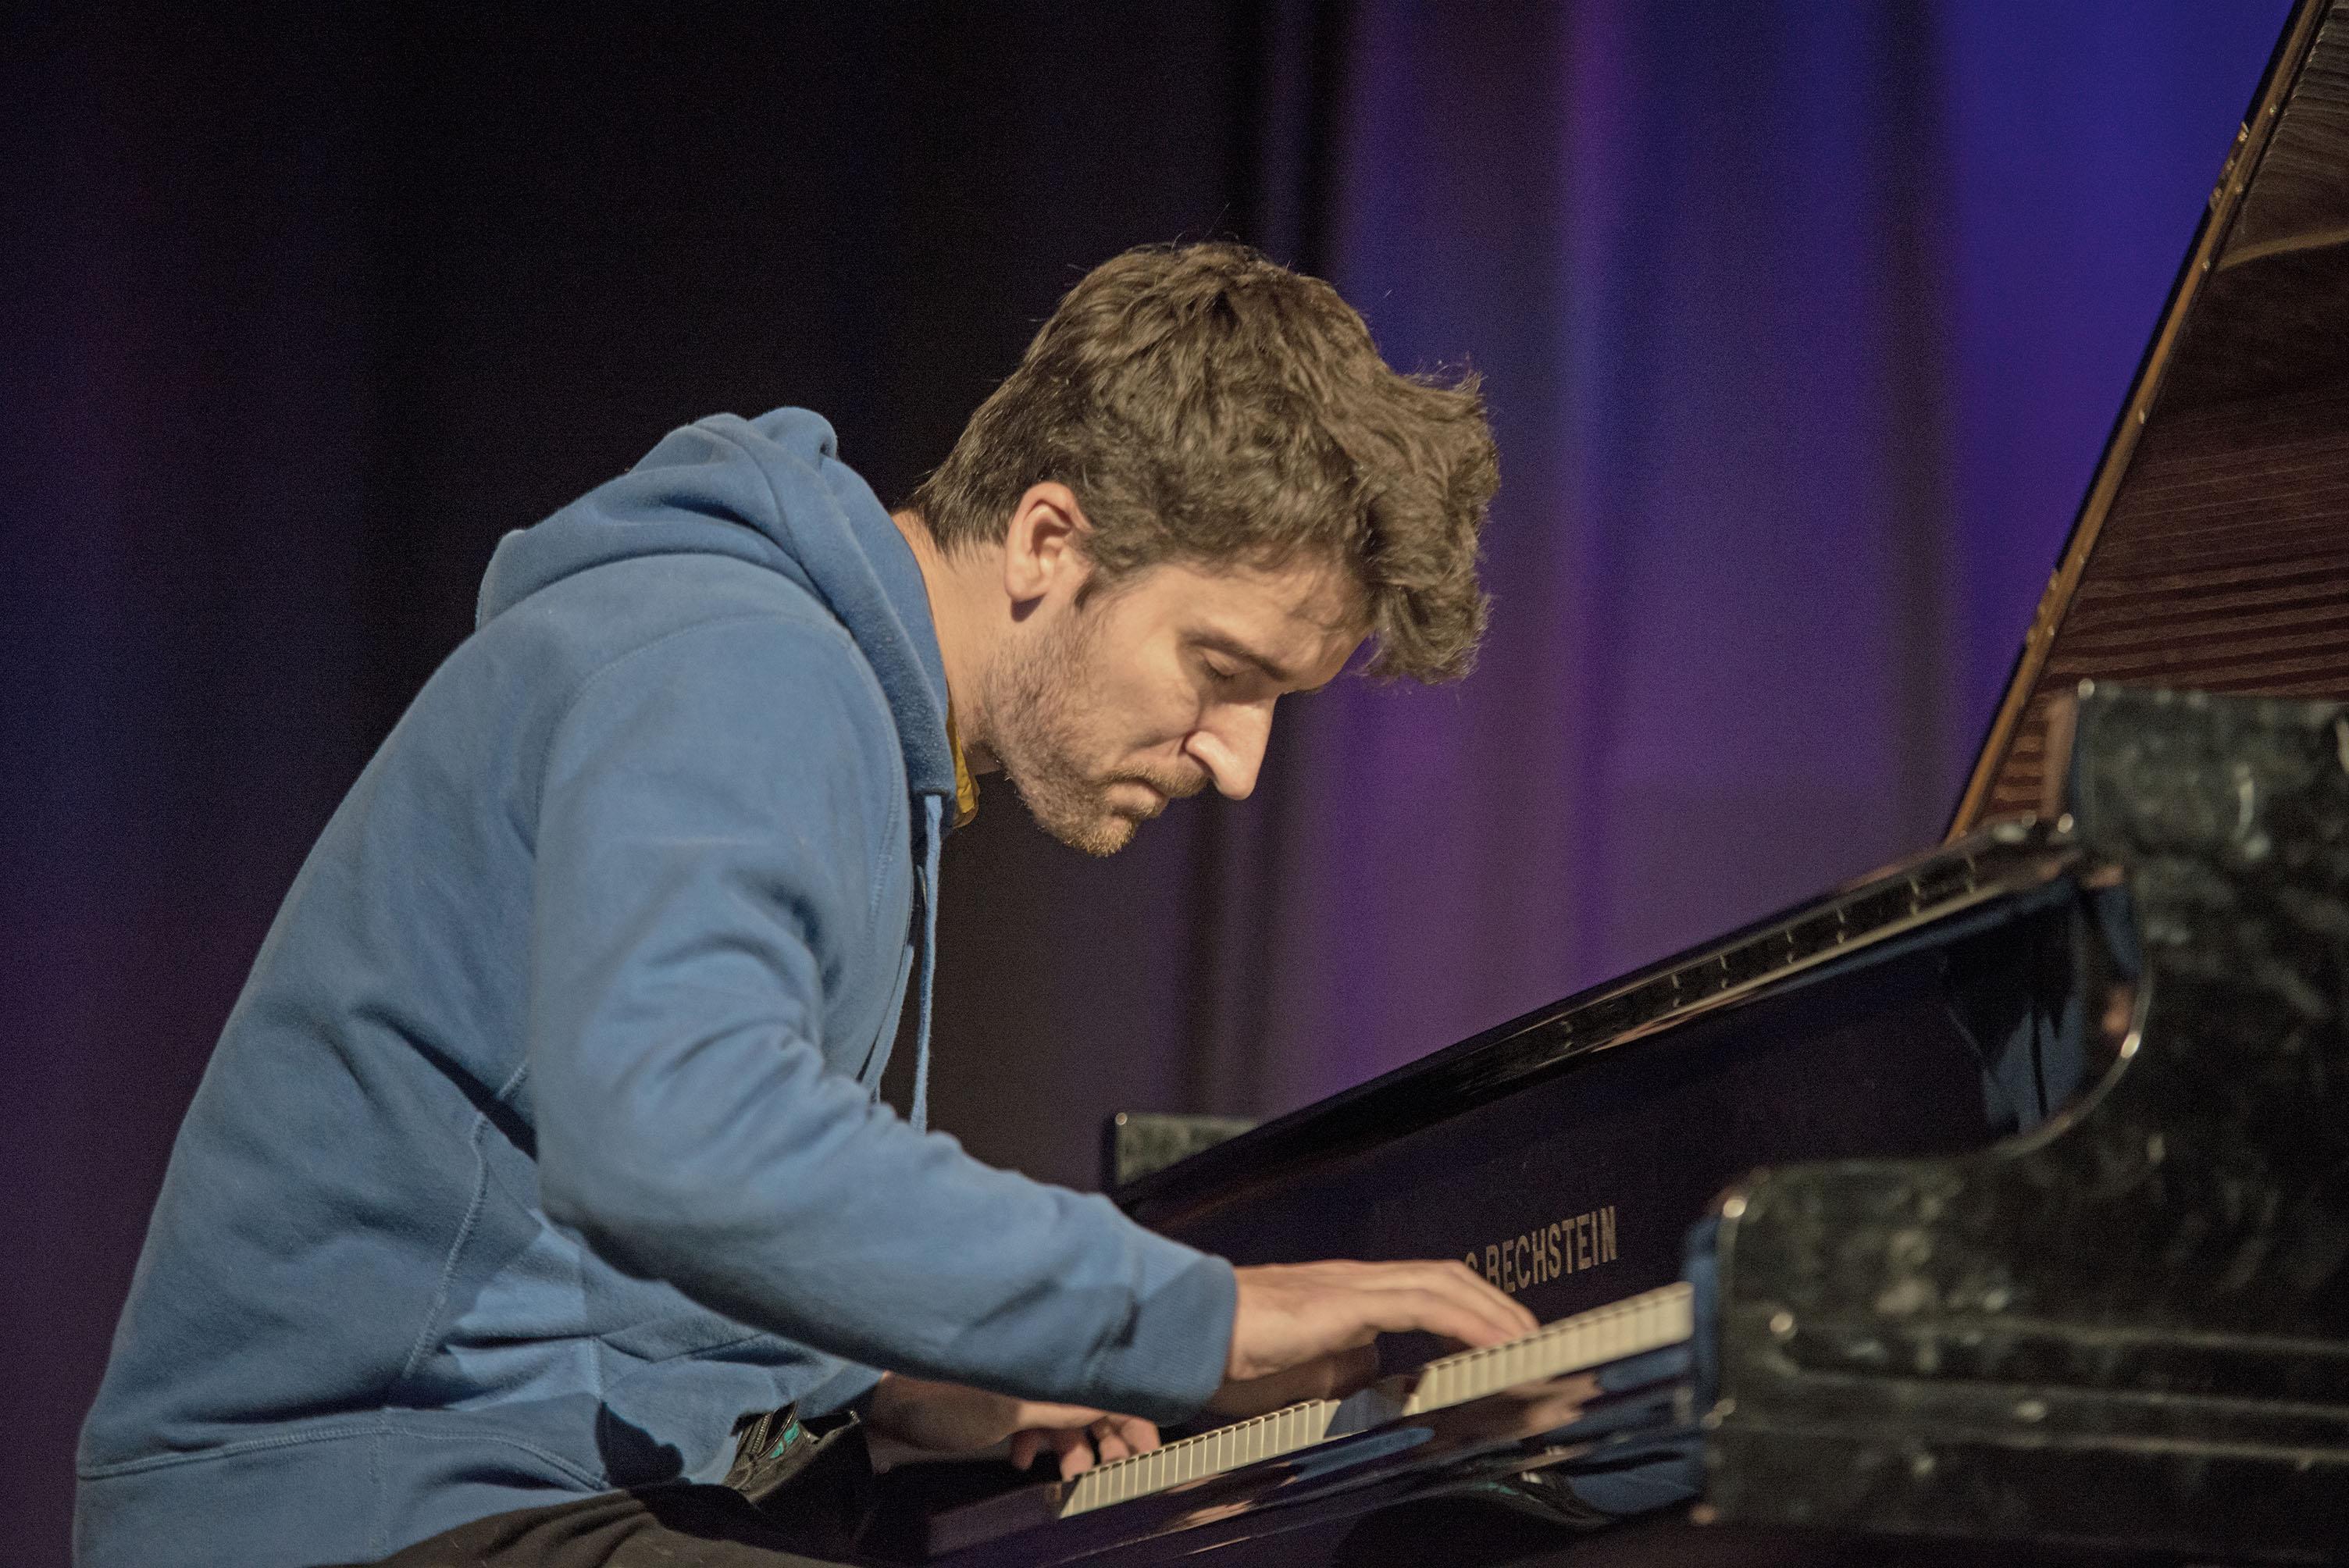 Marcin masecki @ jazztopad 2013